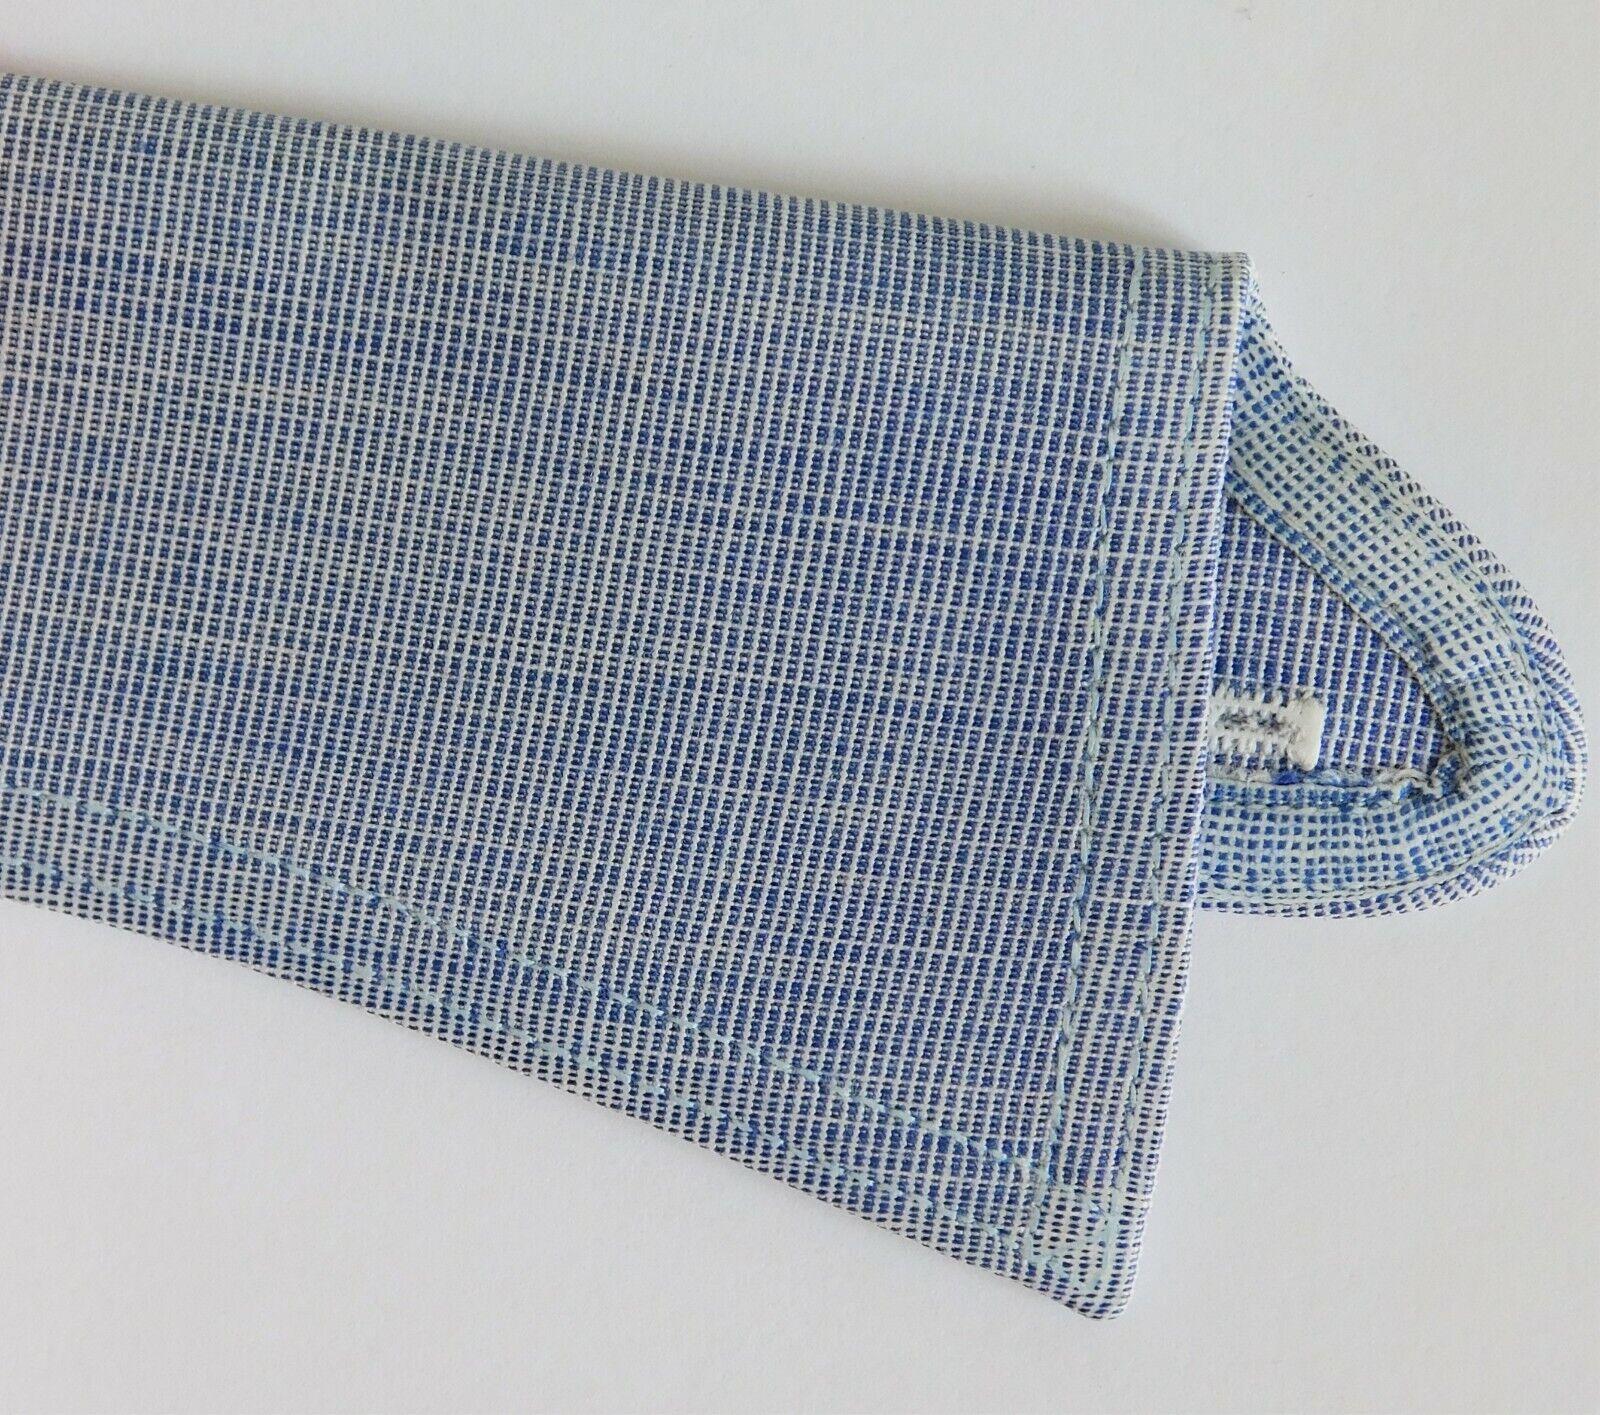 Radiac Rex RAF blue shirt collar size 18.5 UNUSED vintage detachable semi-stiff